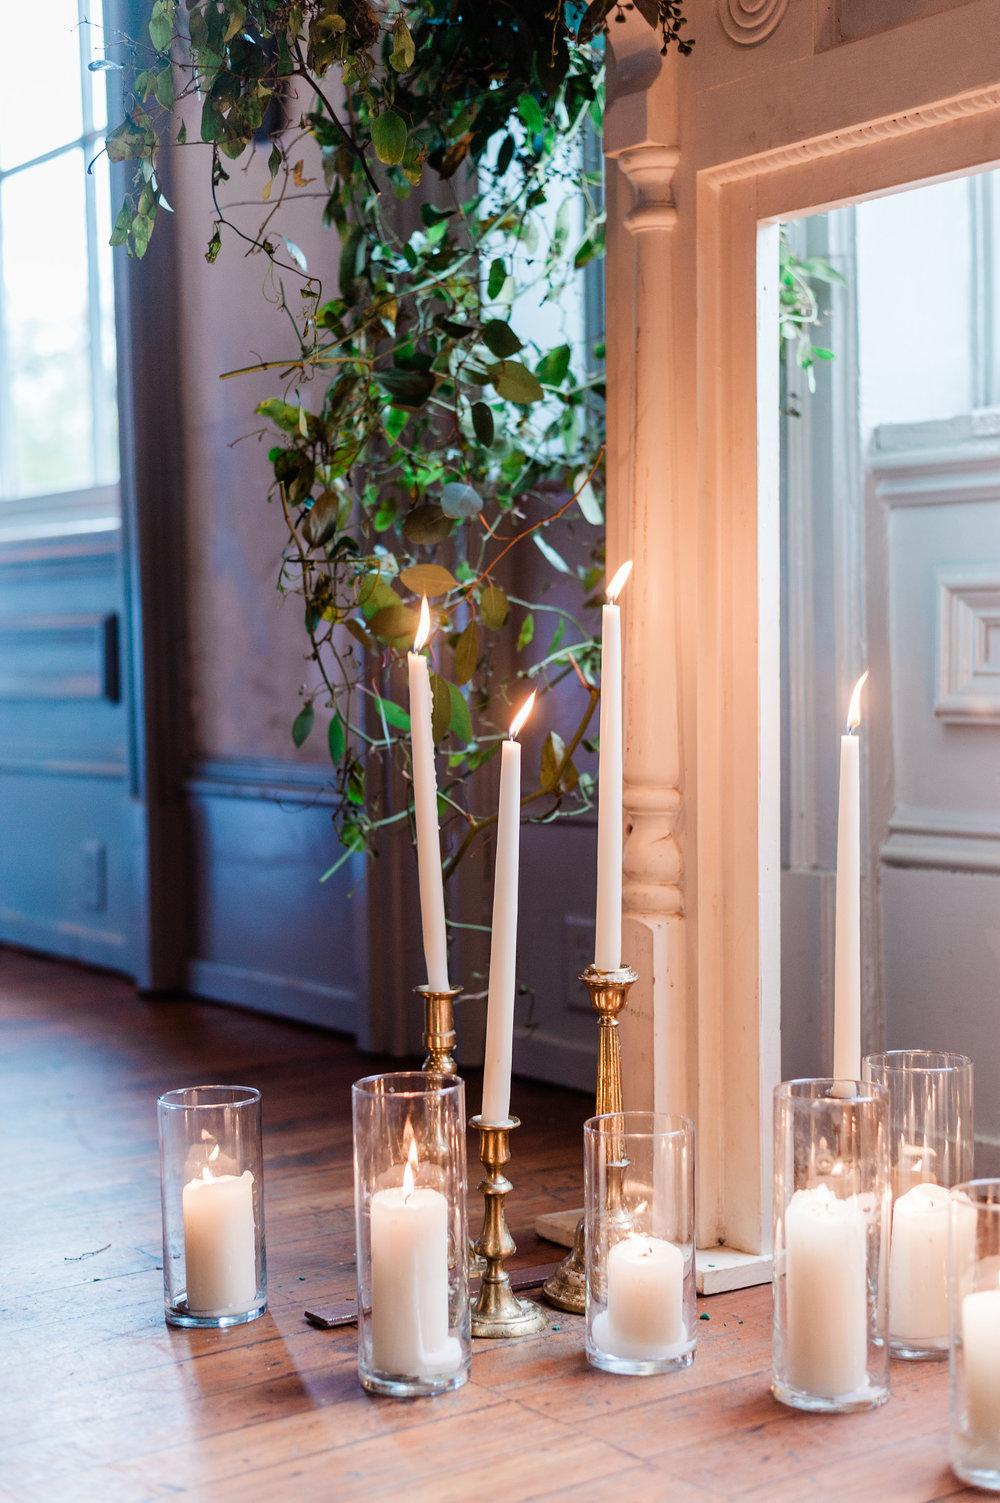 ivory-and-beau-bridal-boutique-i-and-b-florals-kim-and-luke-apt-b-photography-garibaldis-cafe-savannah-savannah-vintage-rentals-15.JPG